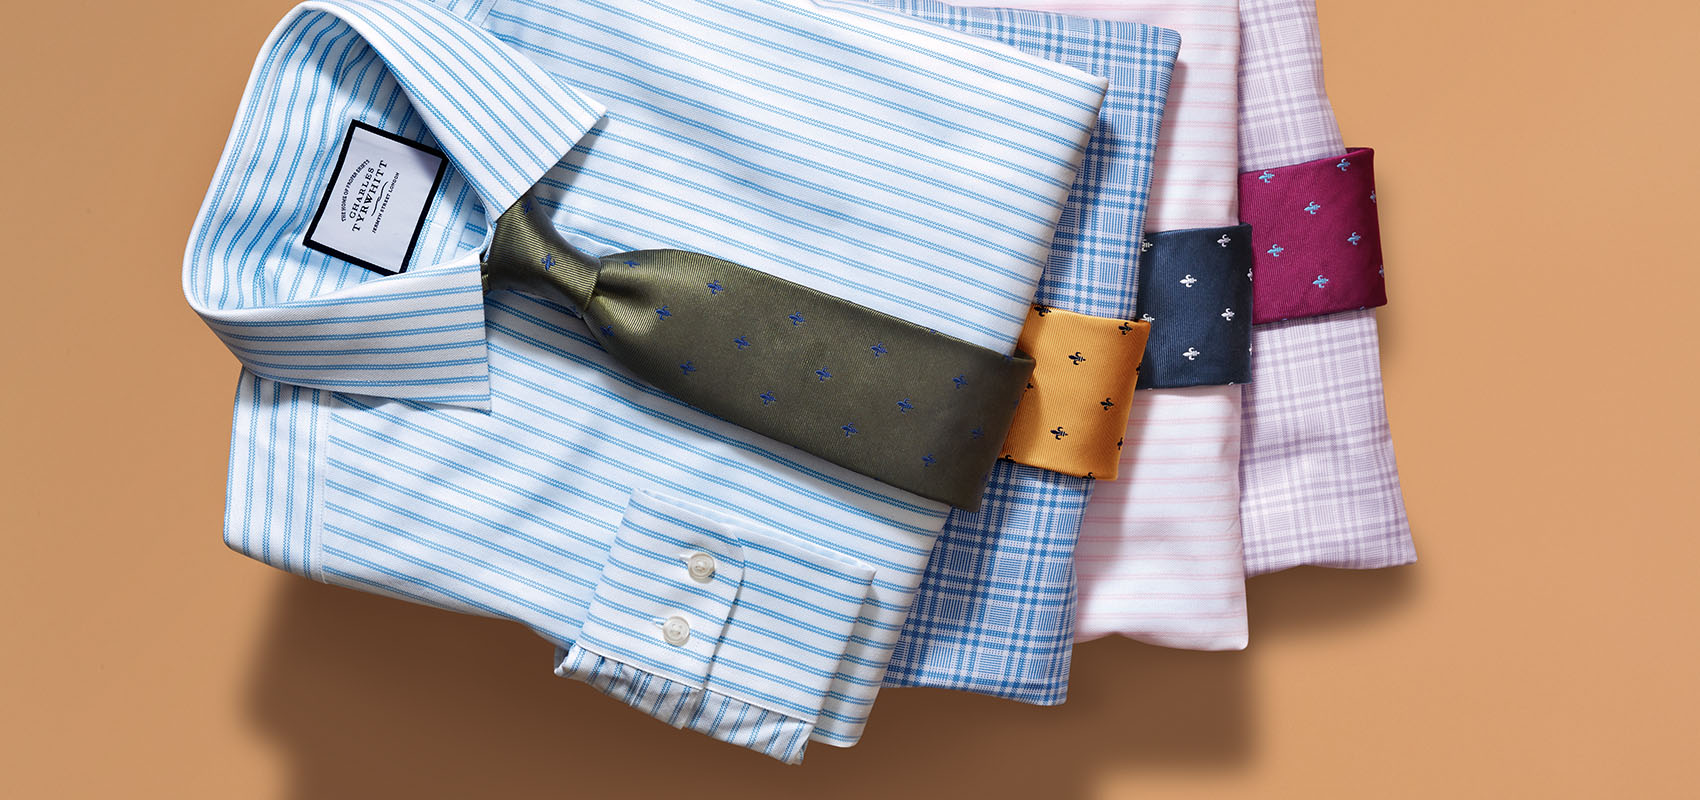 Charles Tyrwhitt Stain resistant ties